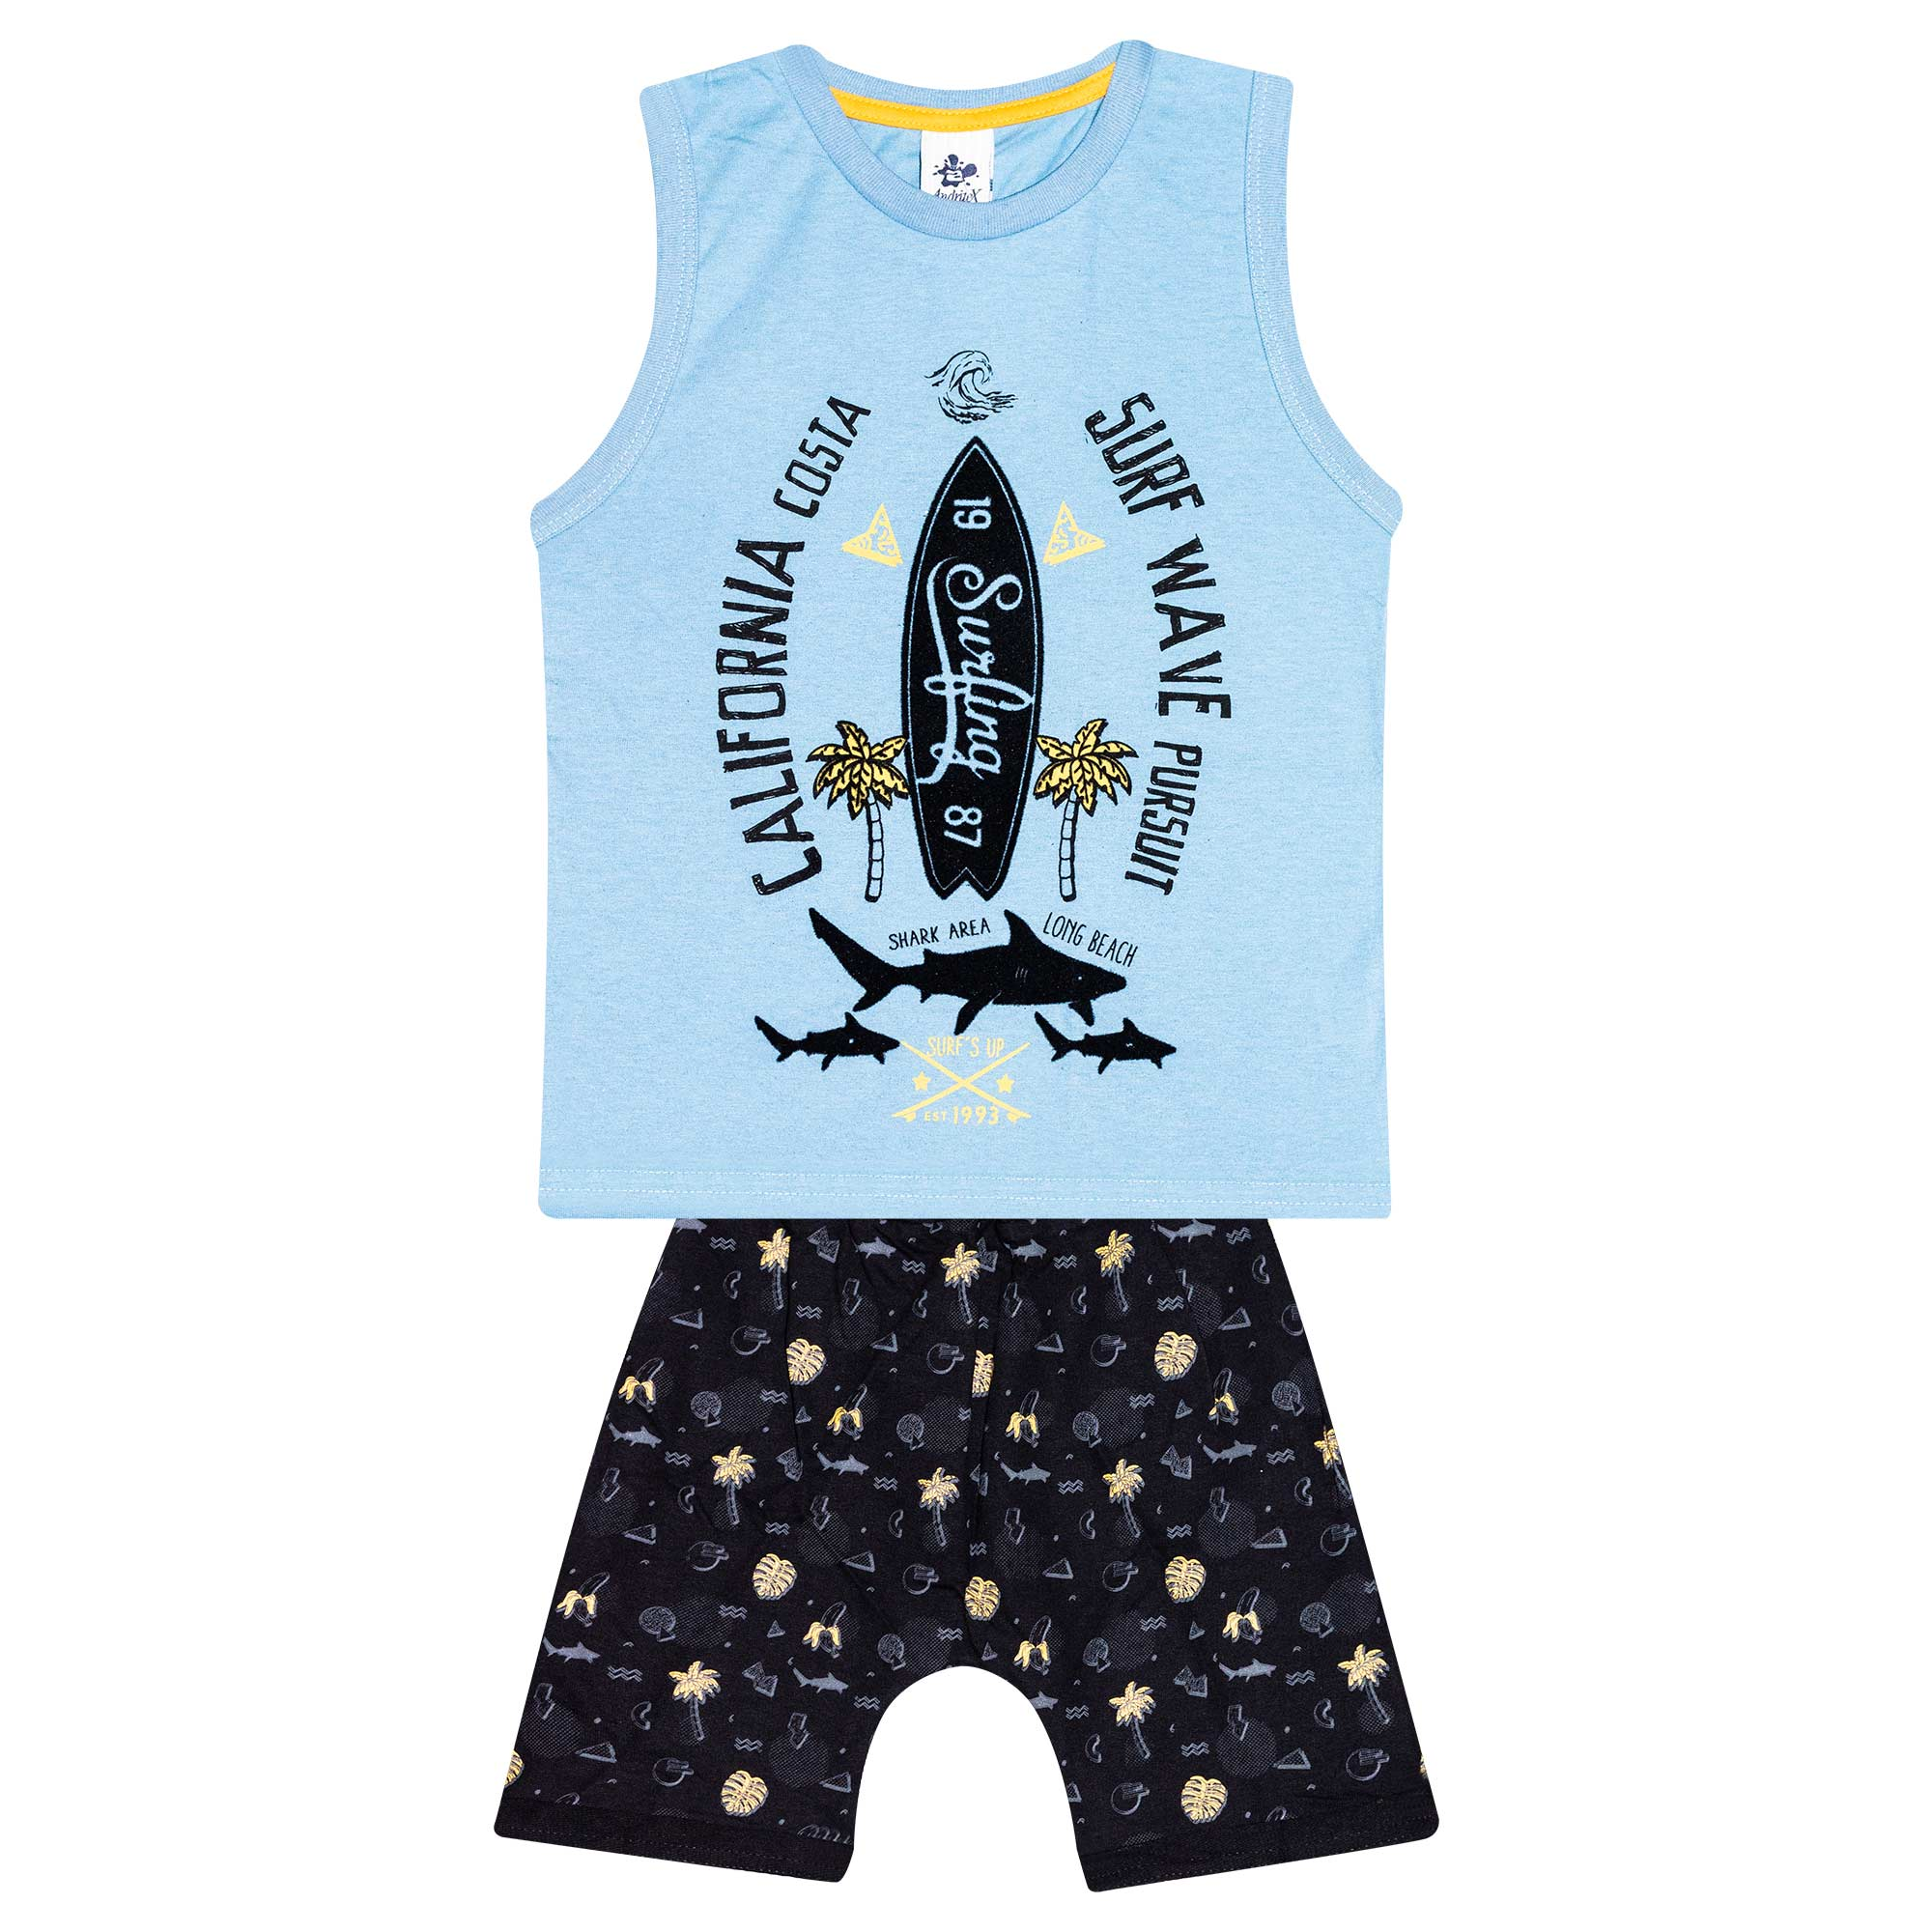 Conjunto Infantil Masculino - Ref 4783  - Azul - Andritex